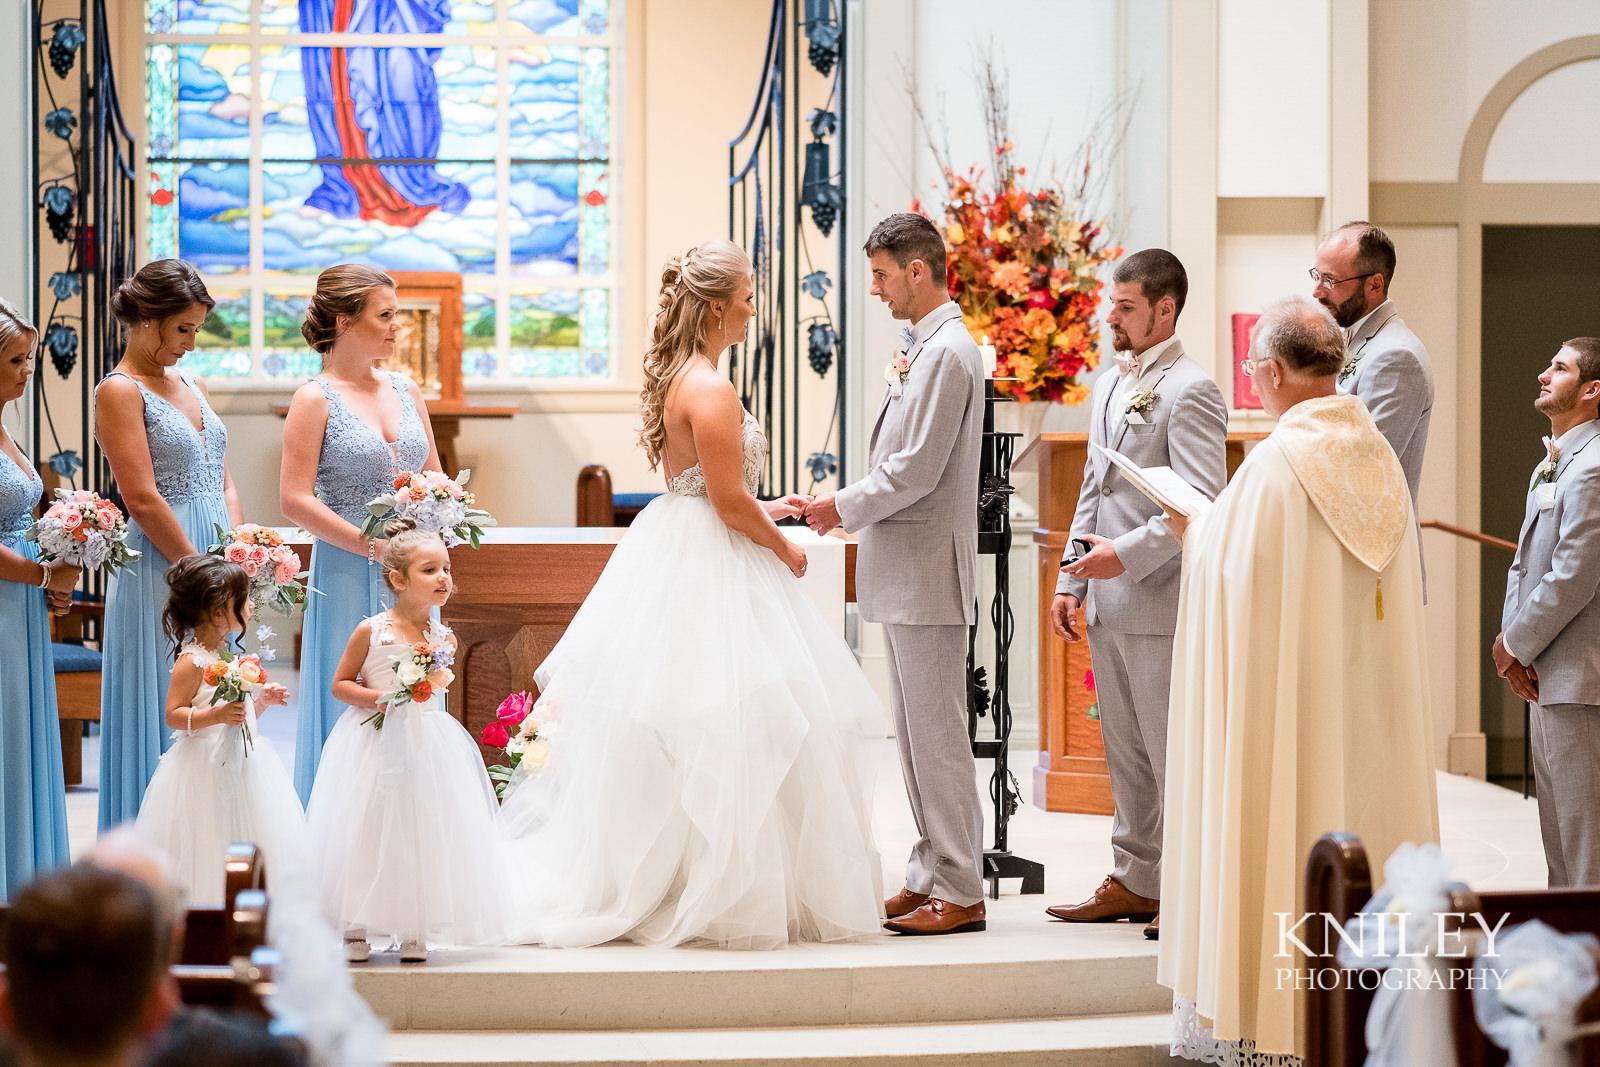 056 - Buffalo NY wedding pictures - St Marys Church - XT2B8636.jpg